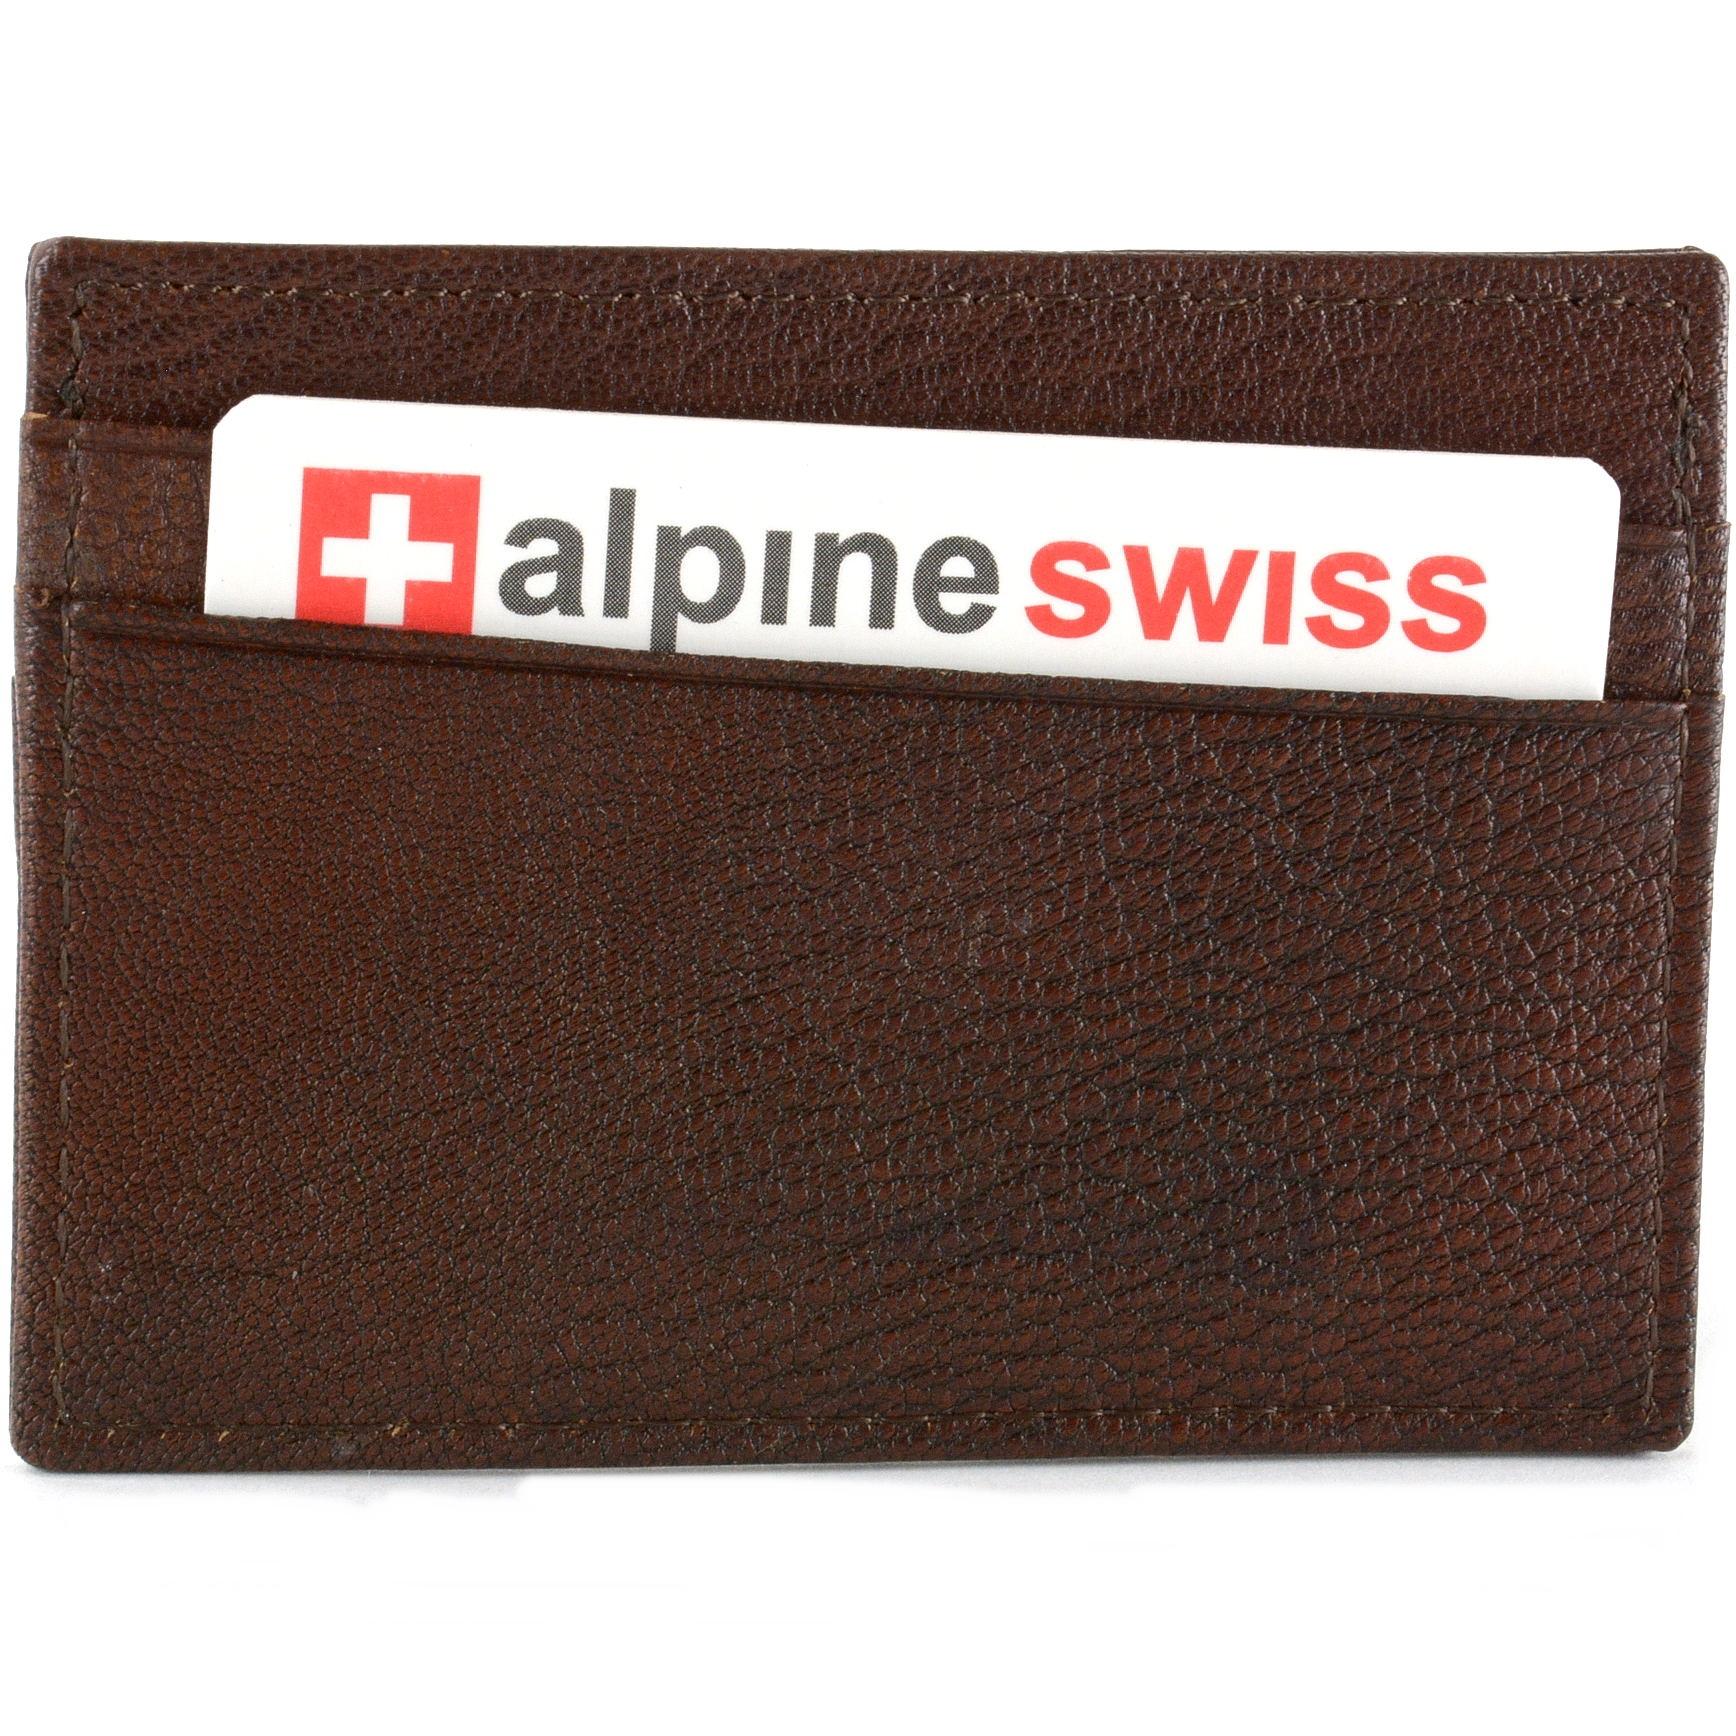 Alpine-Swiss-Minimalist-Leather-Front-Pocket-Wallet-5-Card-Slots-Slim-Thin-Case thumbnail 13